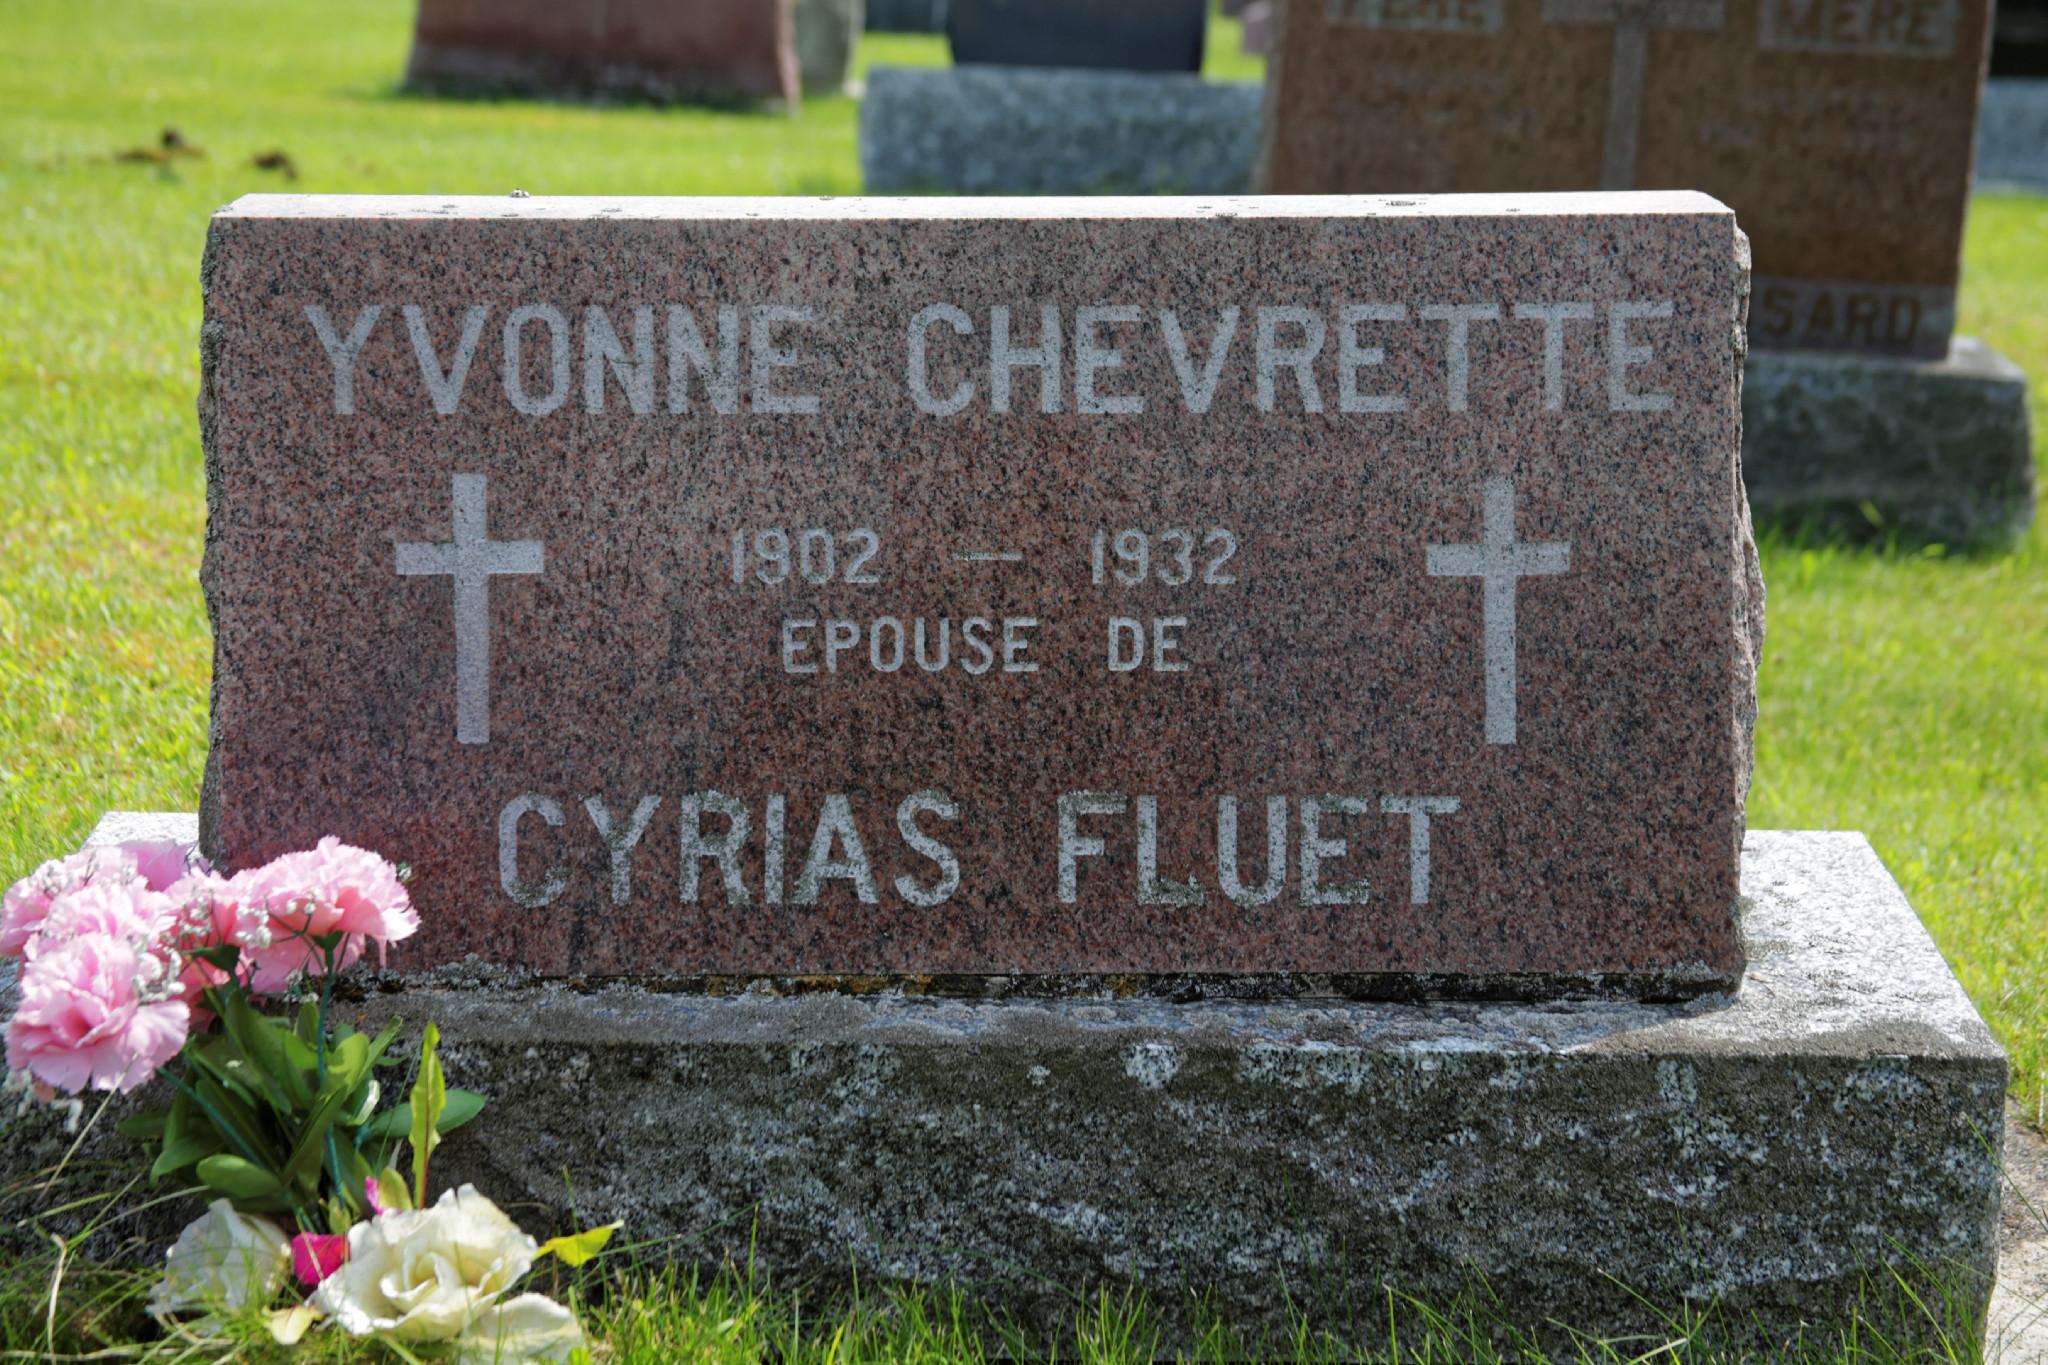 Yvonne Chevrette